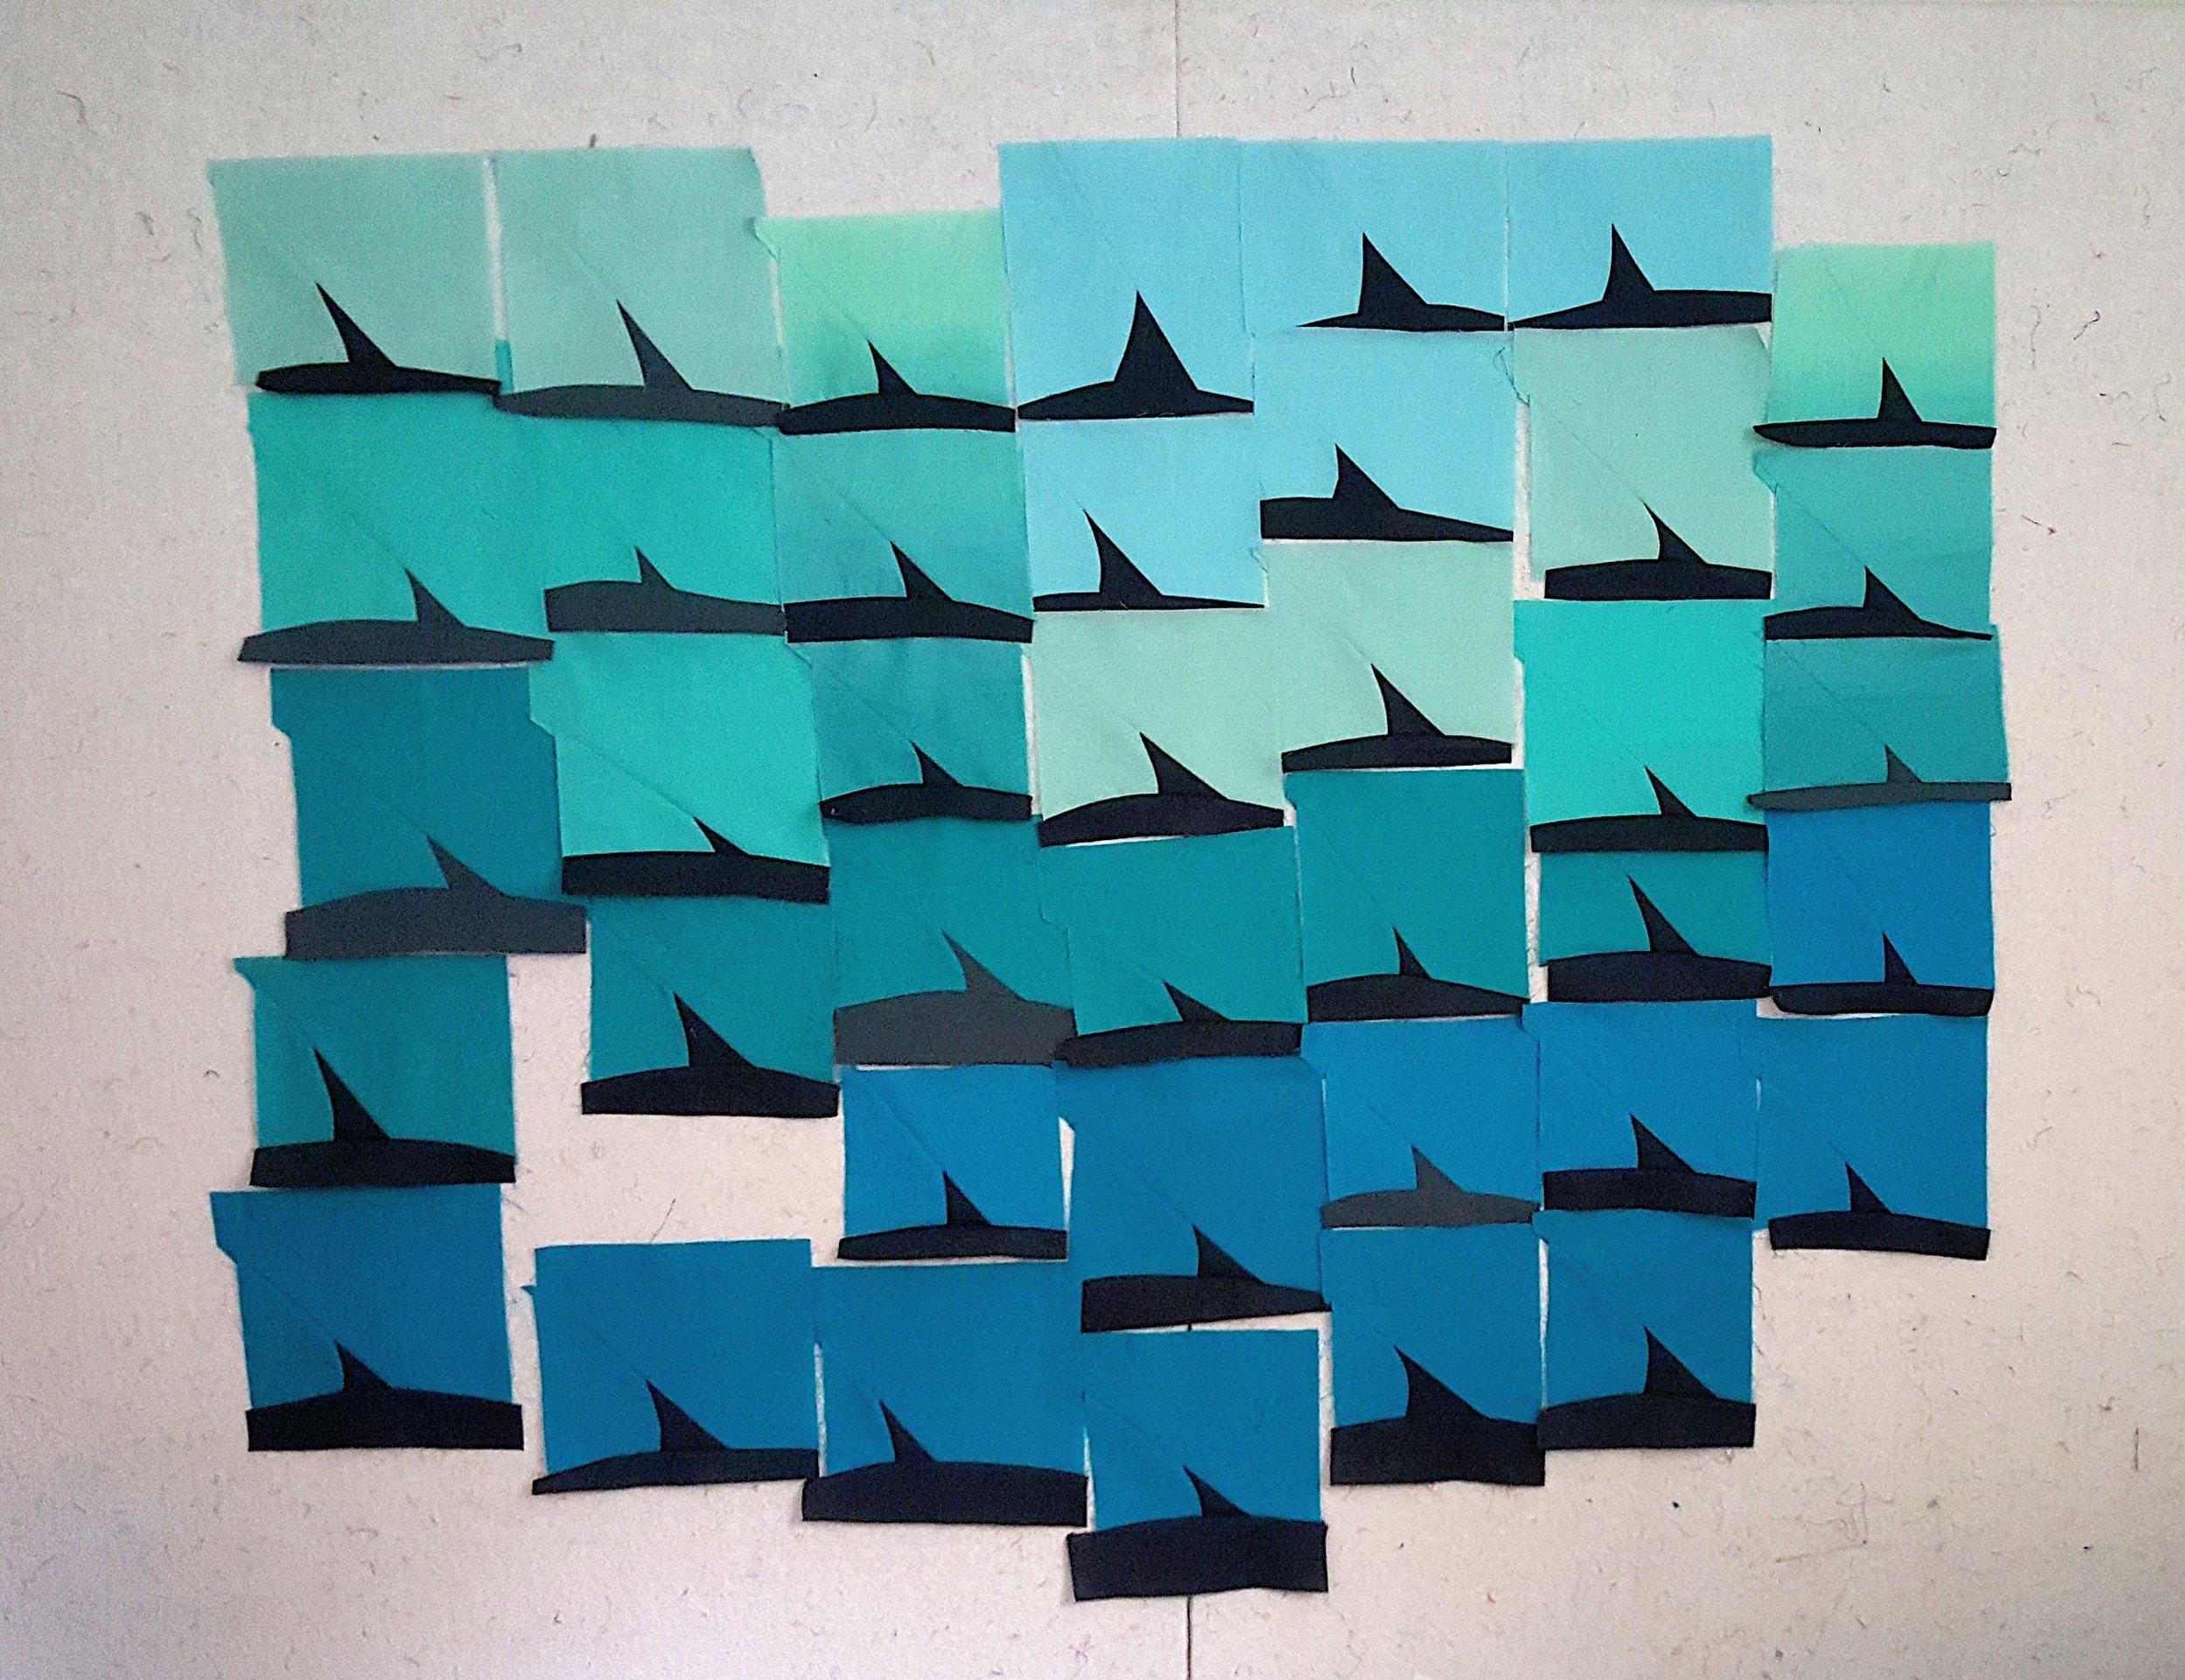 Improv quilt from Shark Week